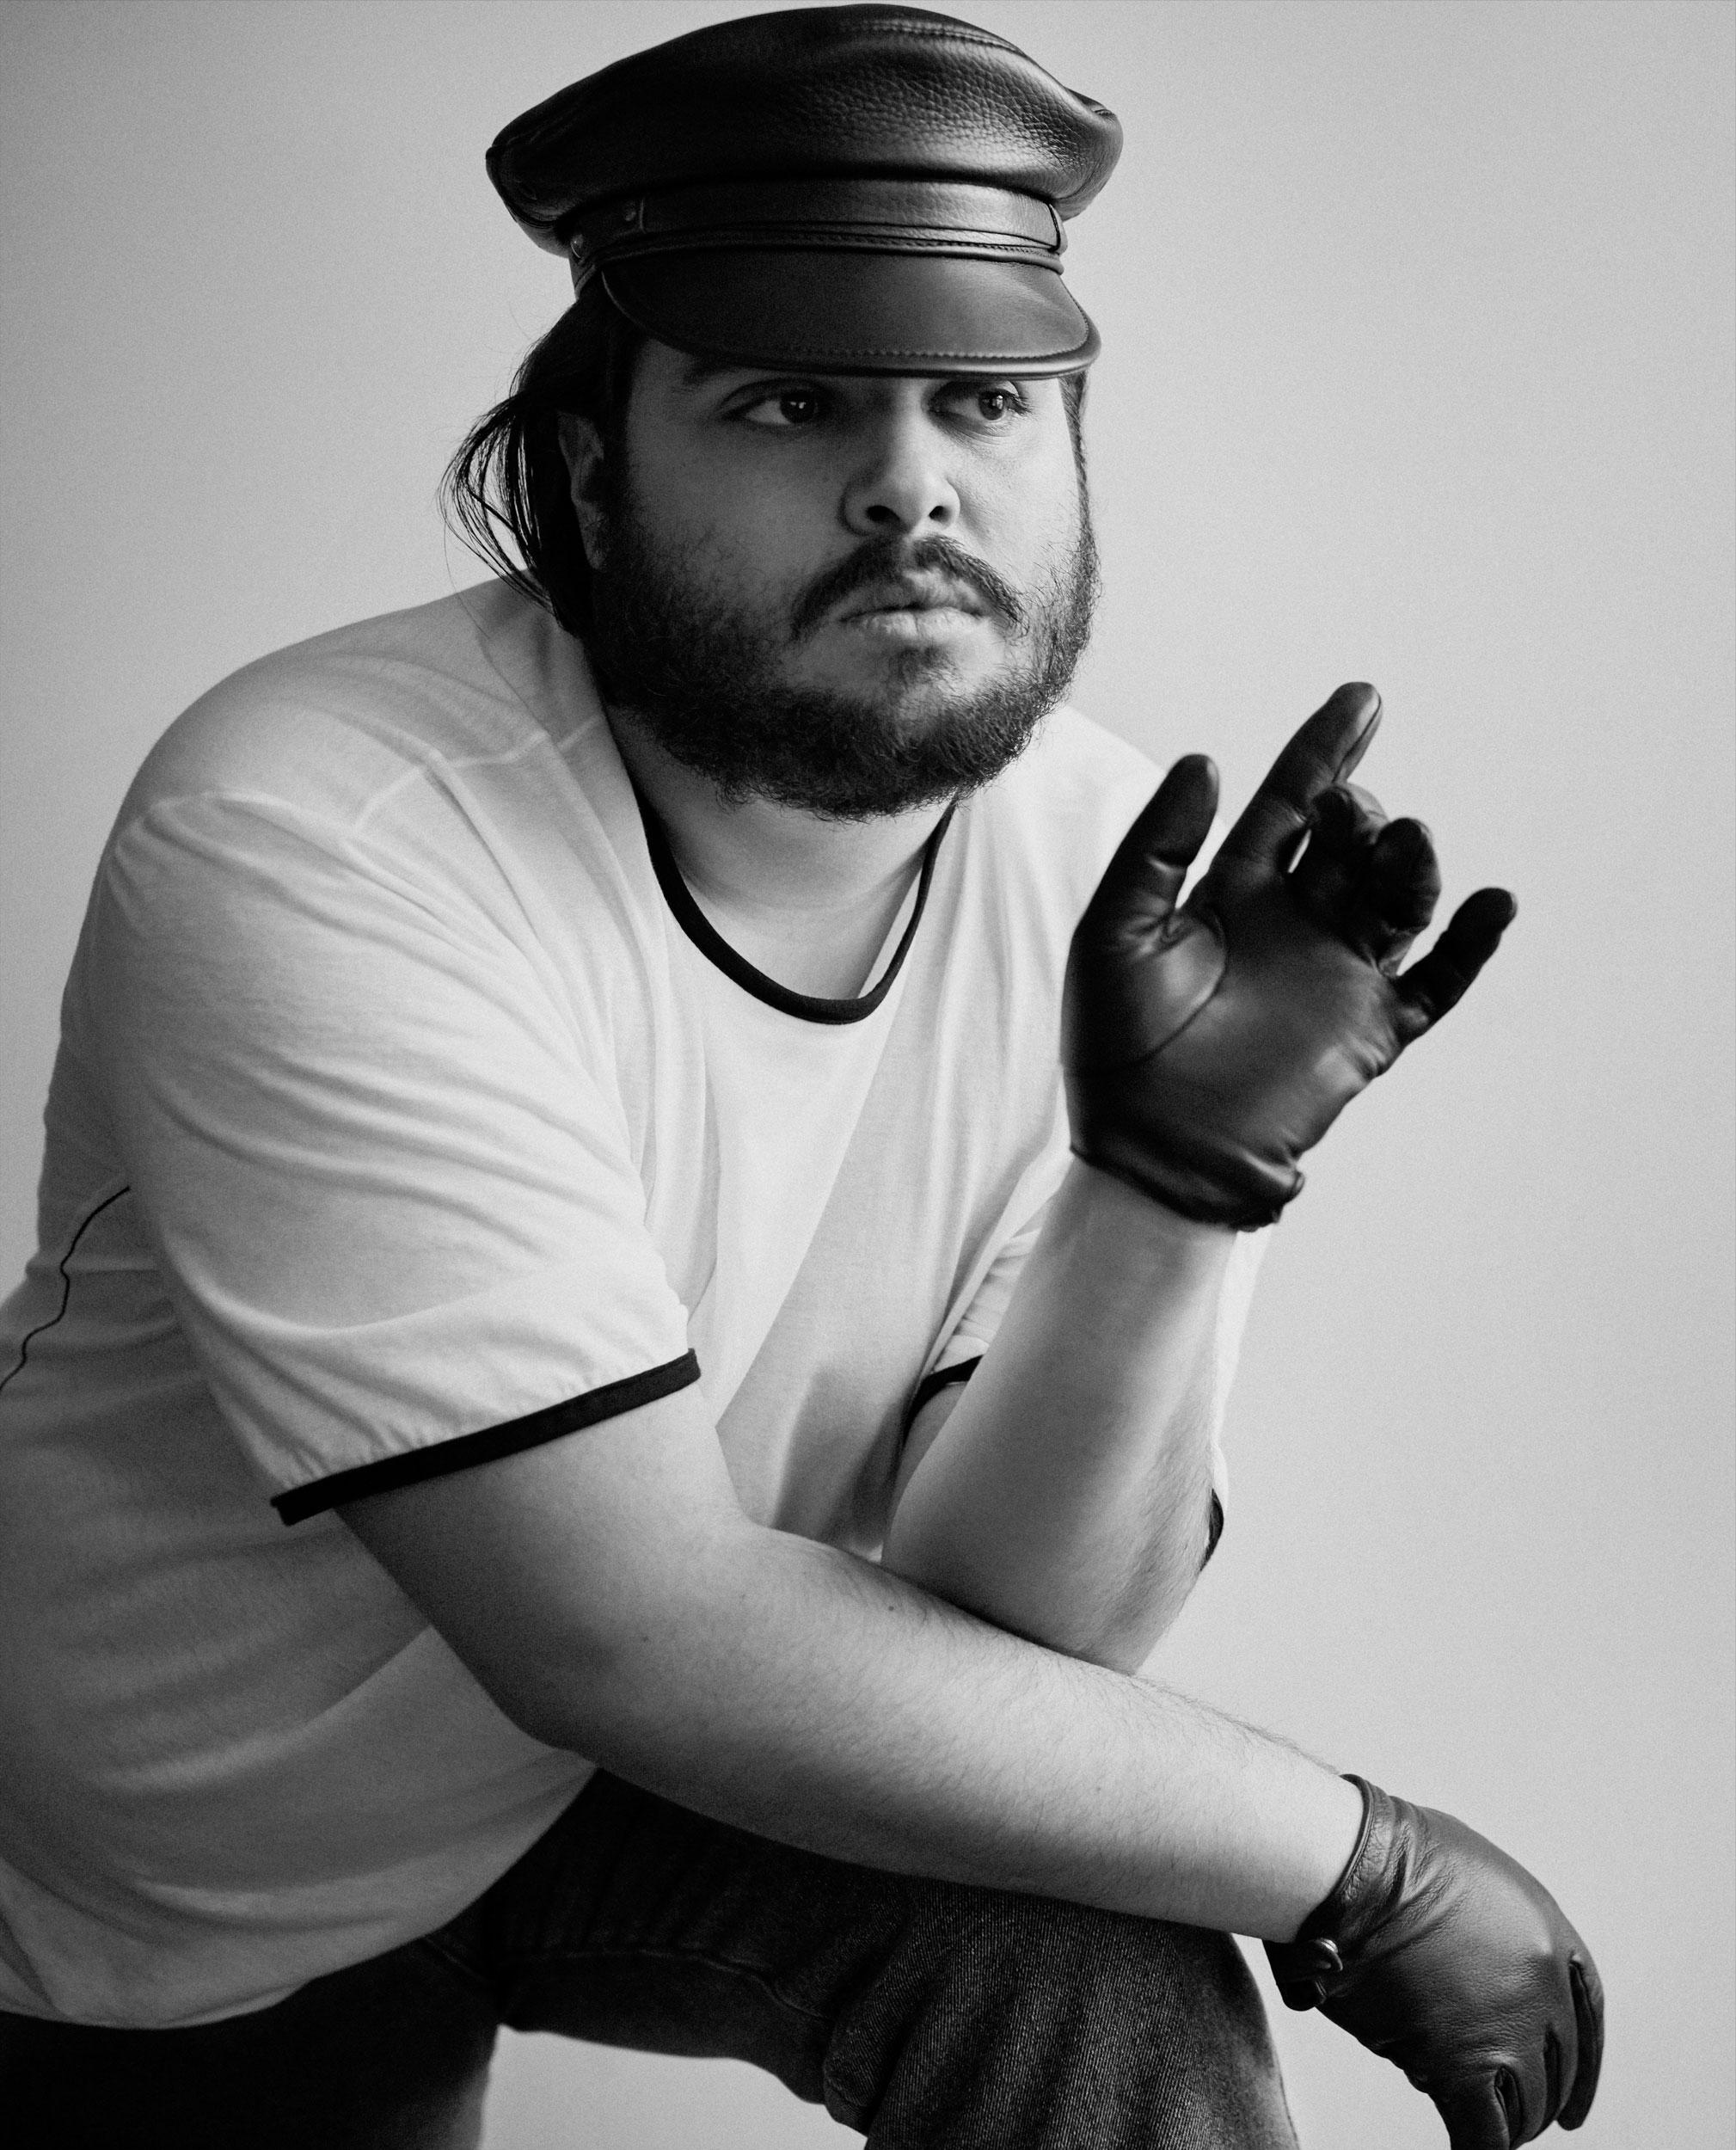 Daniel Riera Portraits